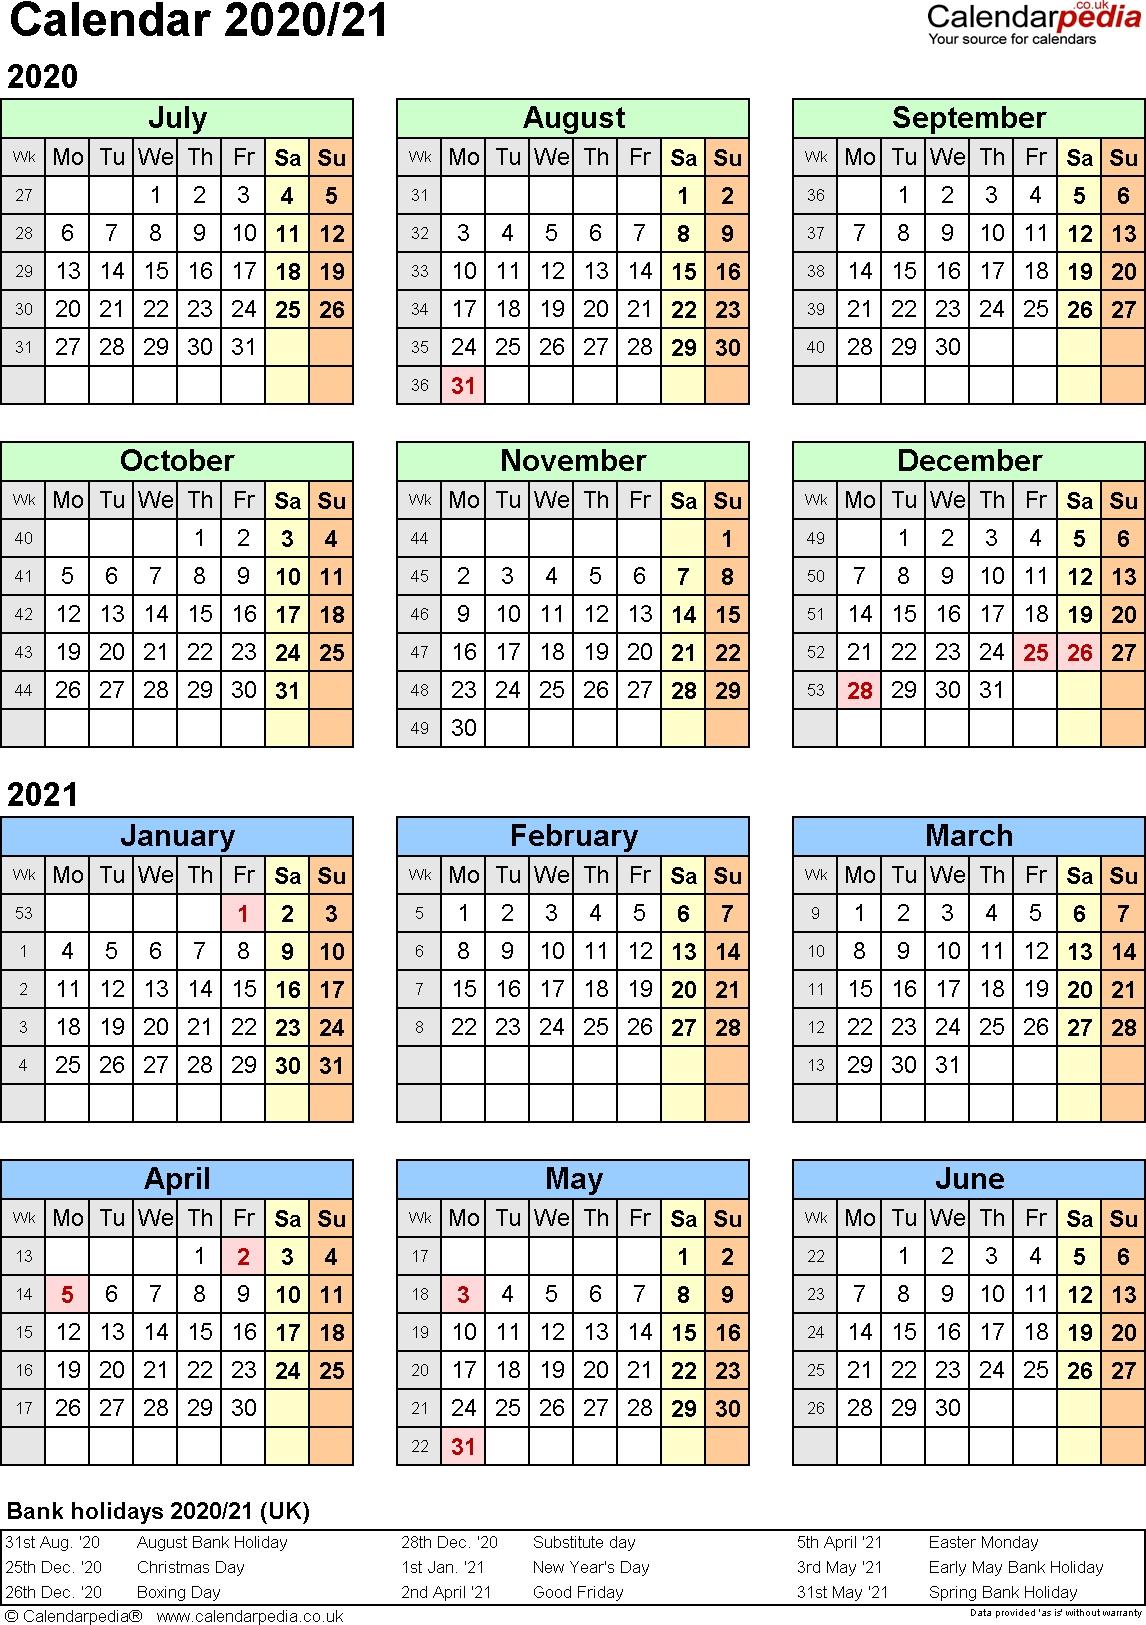 Dod Civilian Pay Calendar 2020 intended for Depo Calendar 2021 Pdf